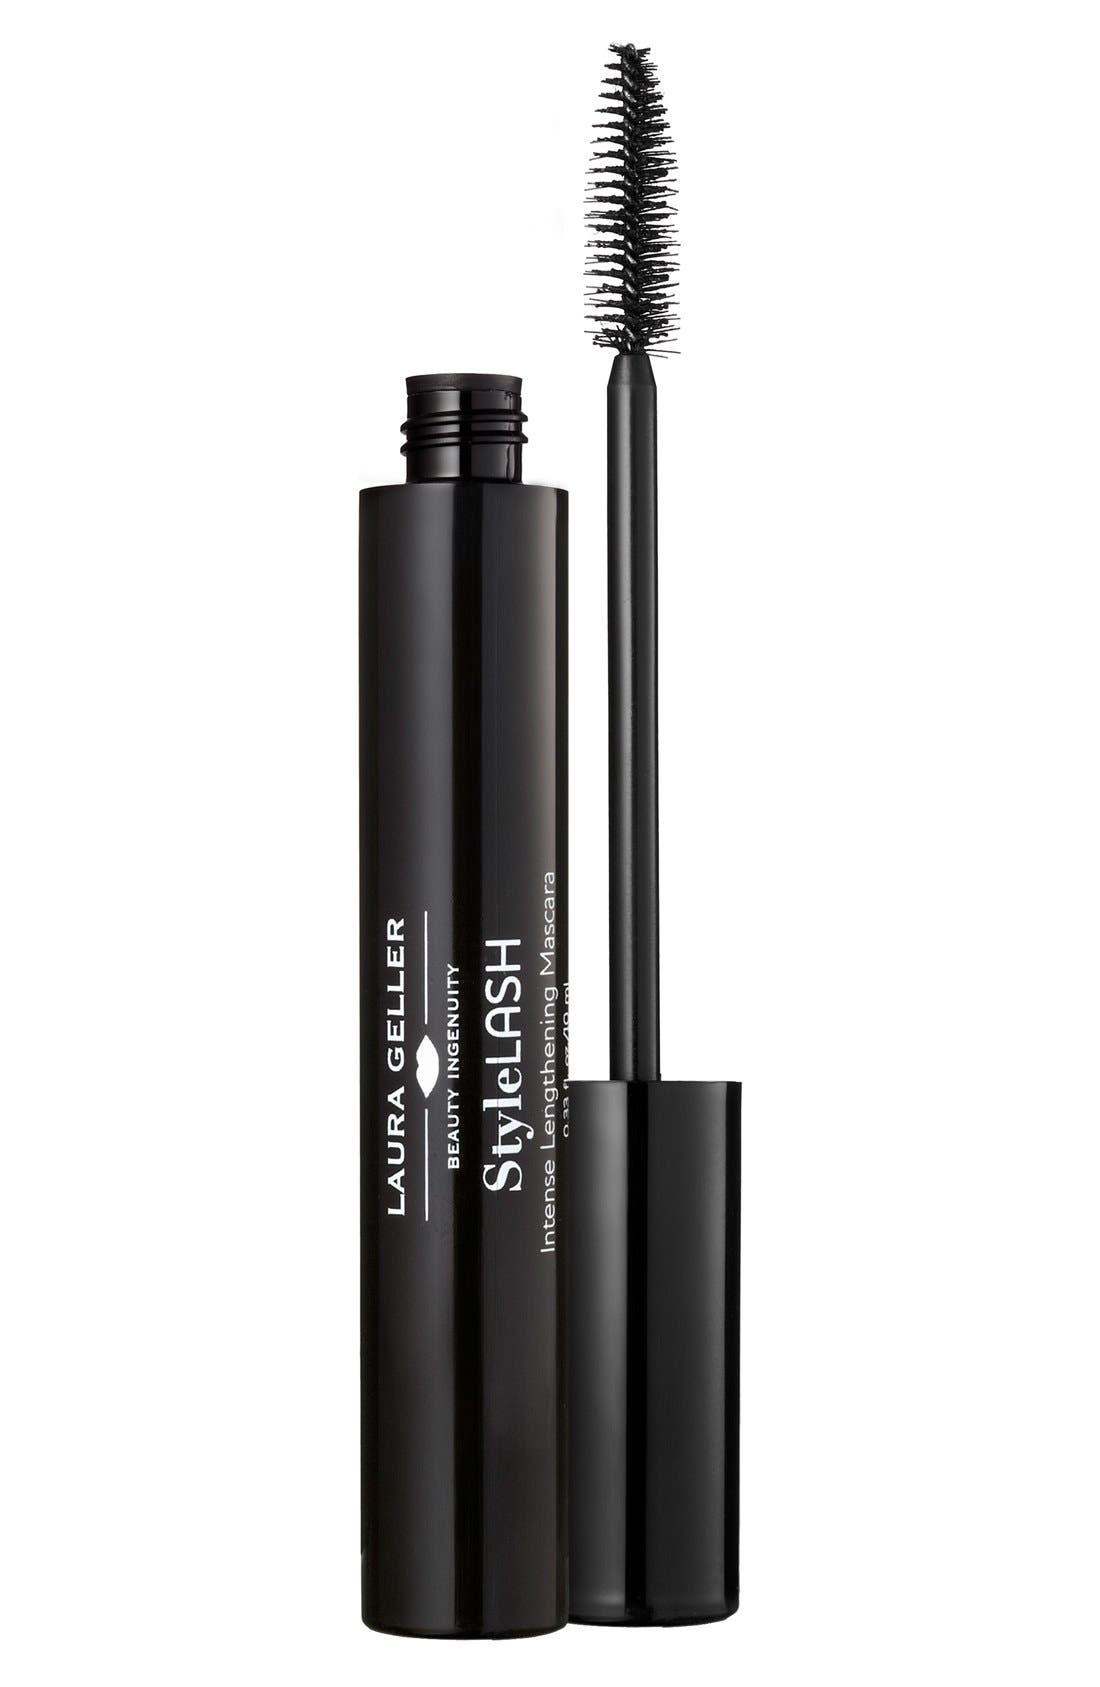 Laura Geller Beauty 'StyleLASH' Intense Lengthening Mascara